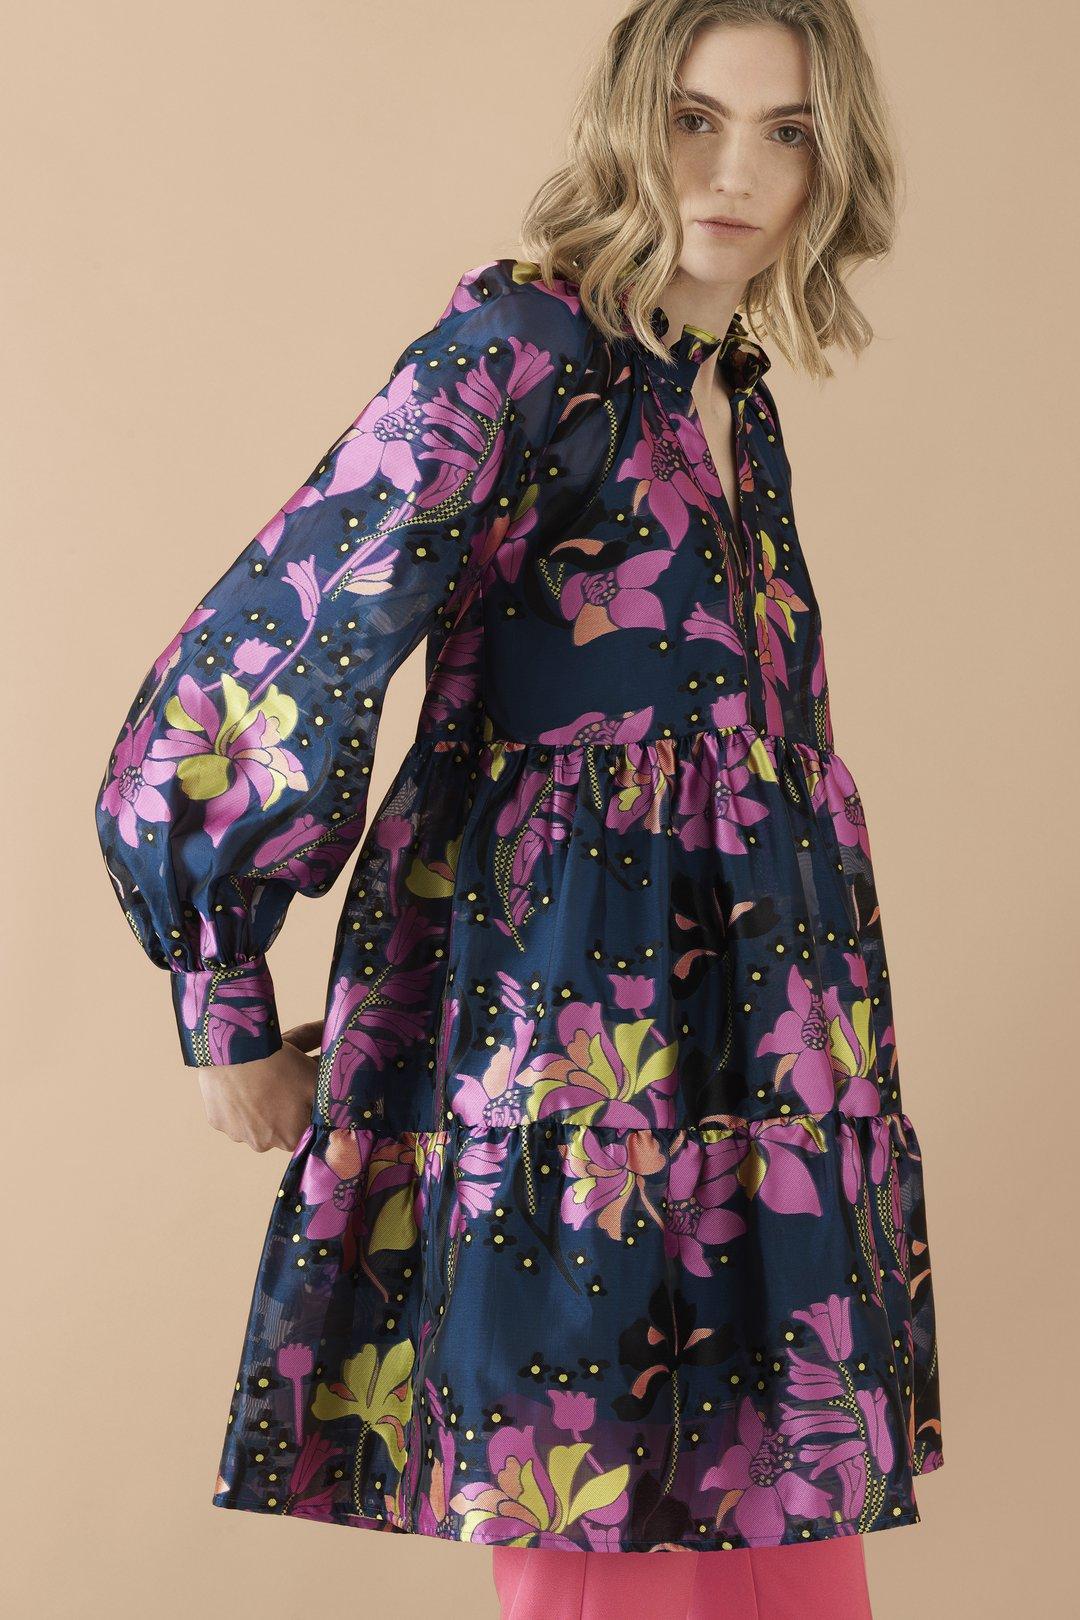 Jasmine_Dress-Dress-SG2470-1641_Daffodil_Indigo-1_1080x.jpg